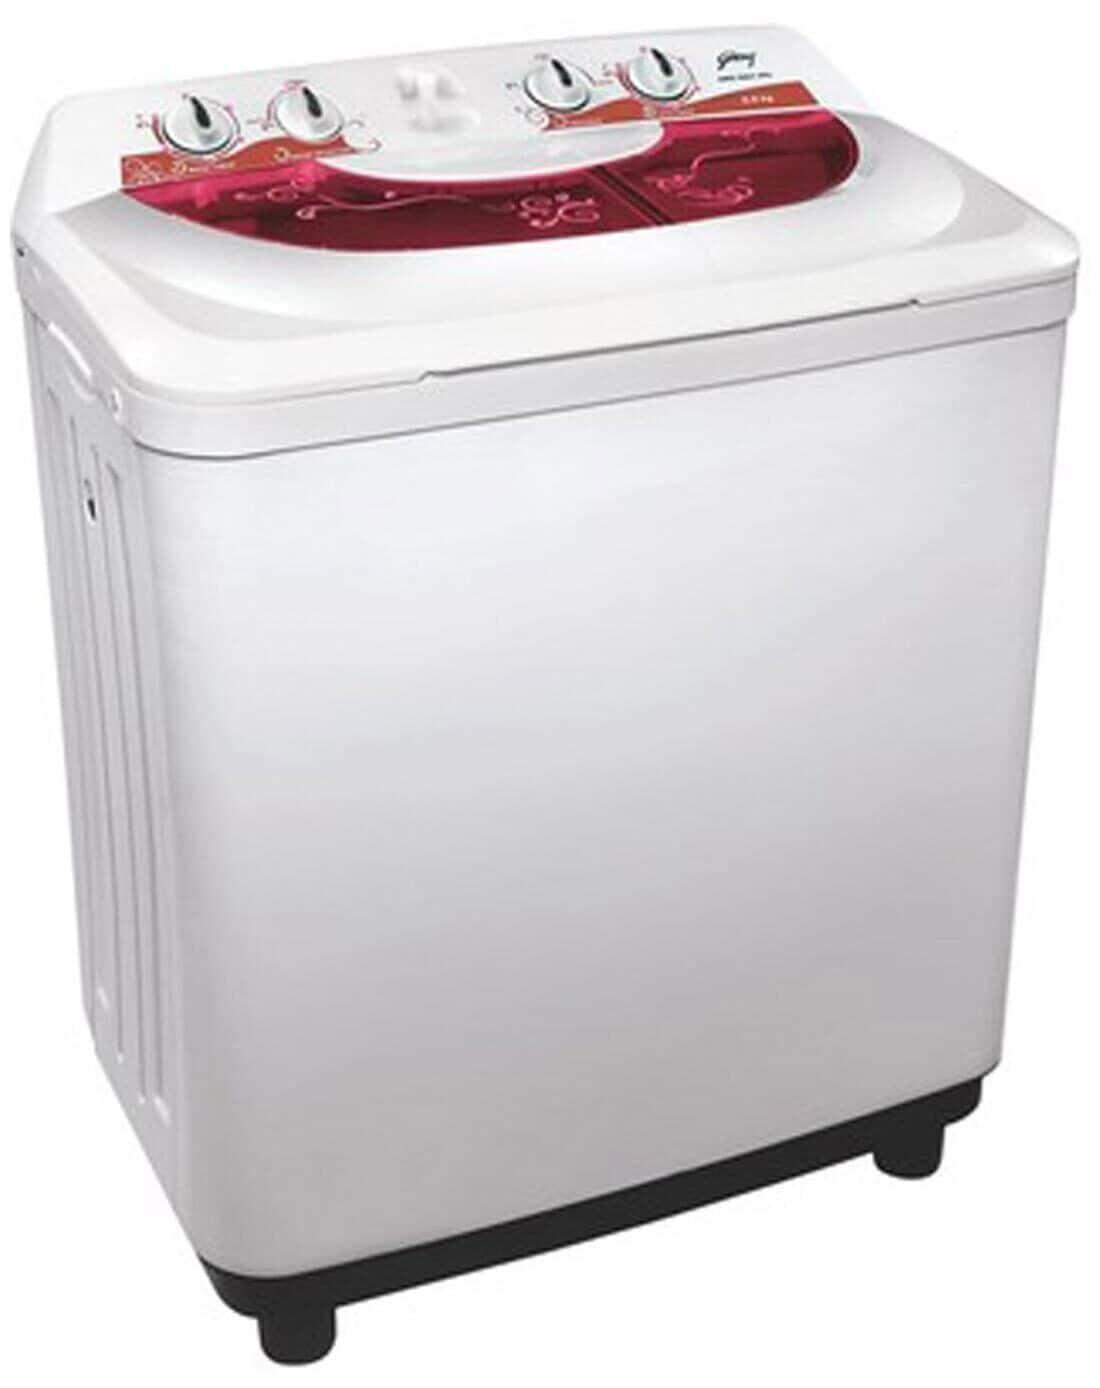 Godrej 6.8 kg Semi Automatic Top Load Washing Machine (GWS 6801 PPL, White & Red)